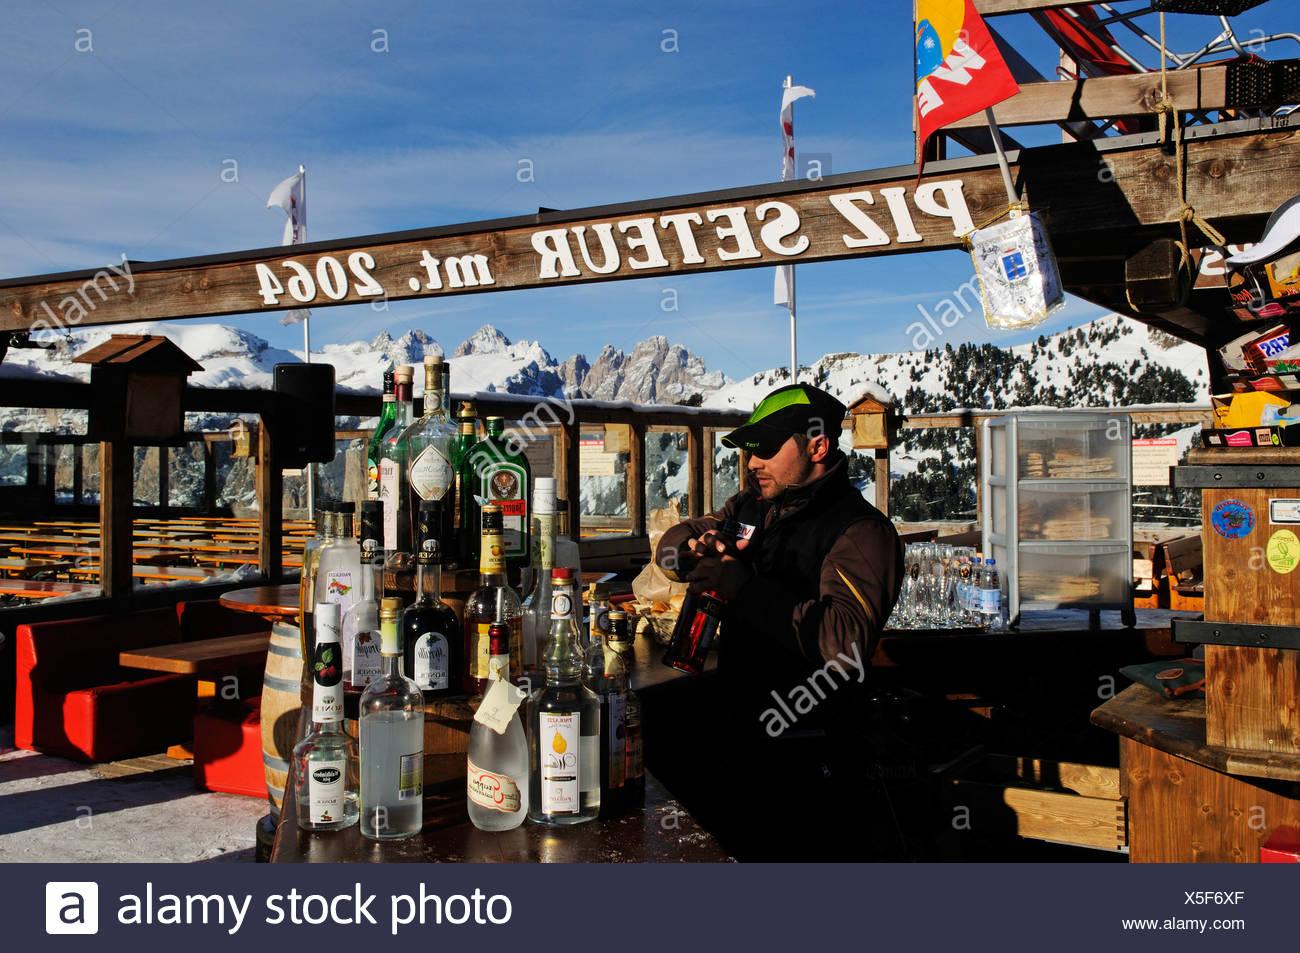 Ski piste at Santa Cristina, Selva, Langkofel mountain, Sella Ronda, Val Gardena, South Tyrol, Italy, Europe Stock Photo